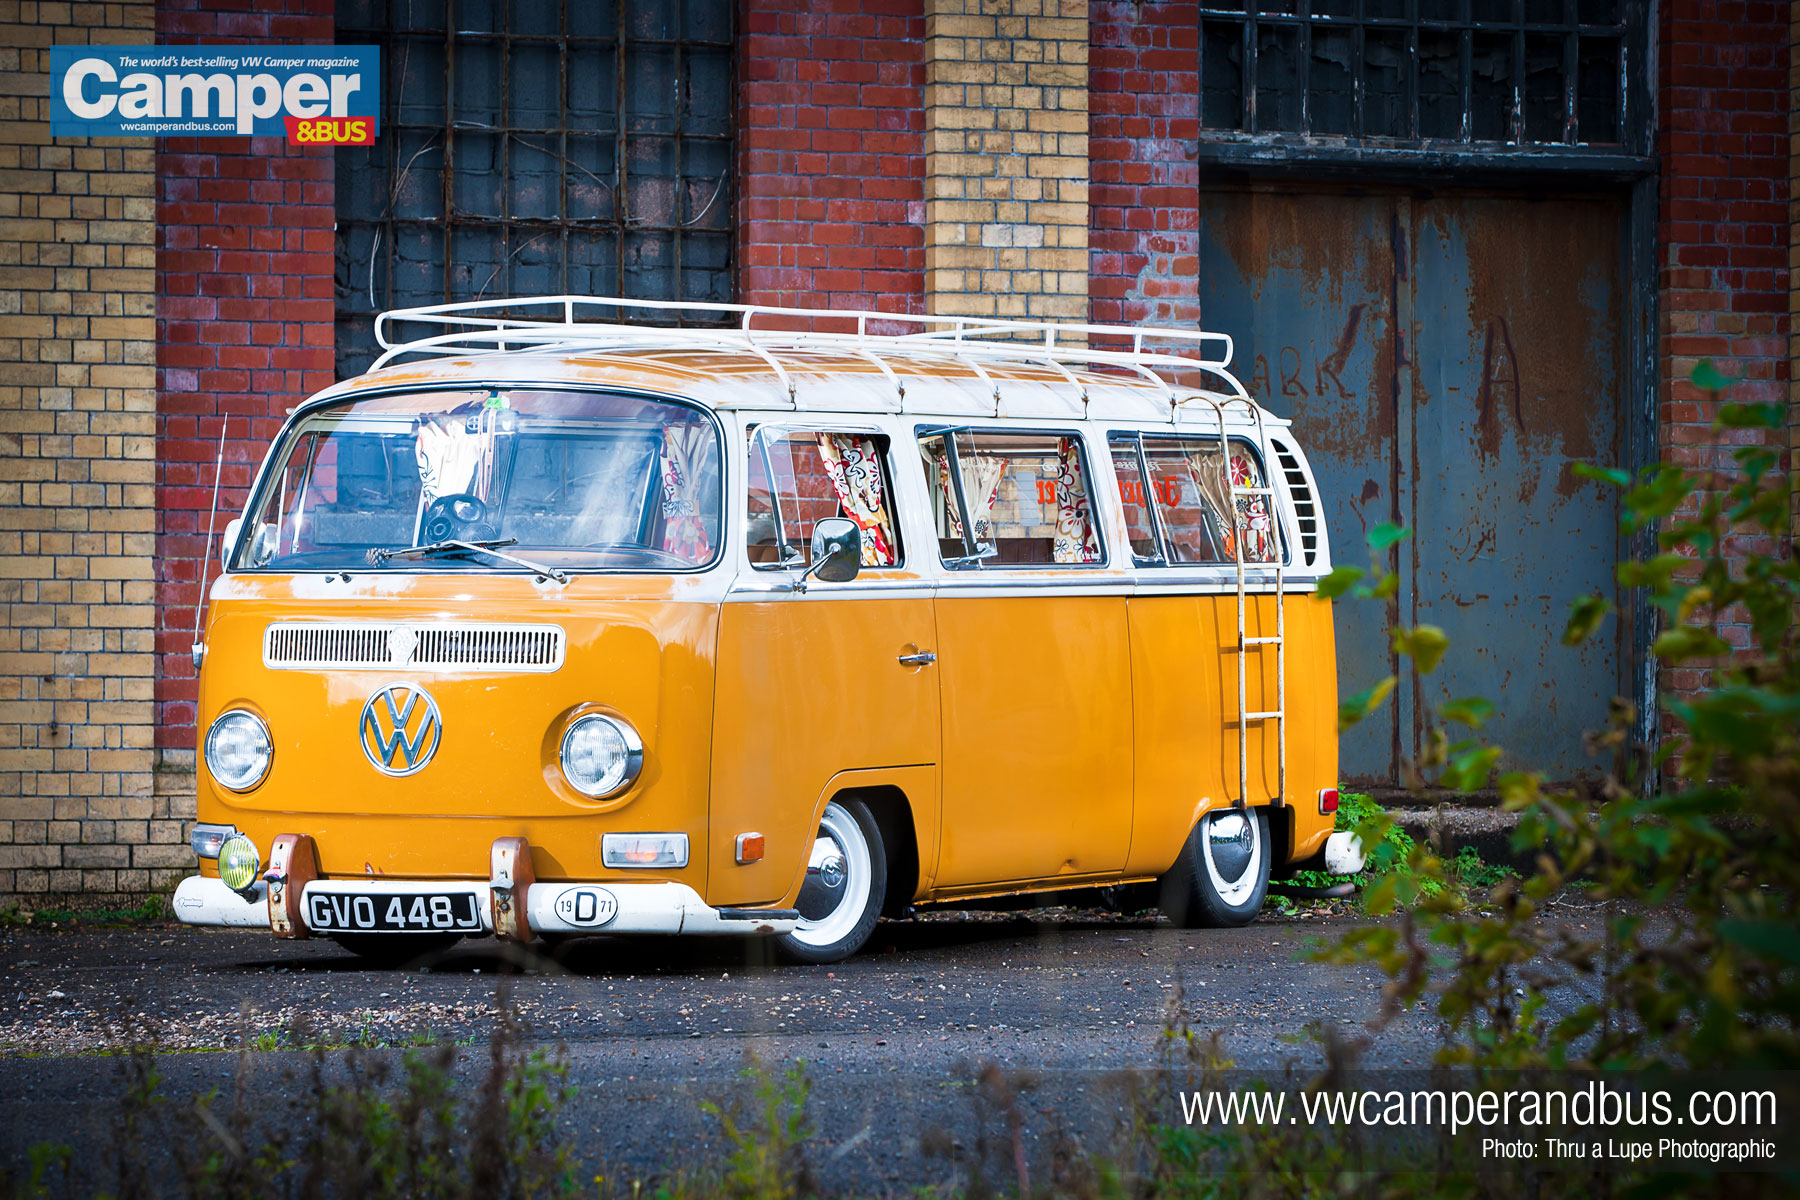 Vw Desktop Wallpaper Vw Camper And Bus